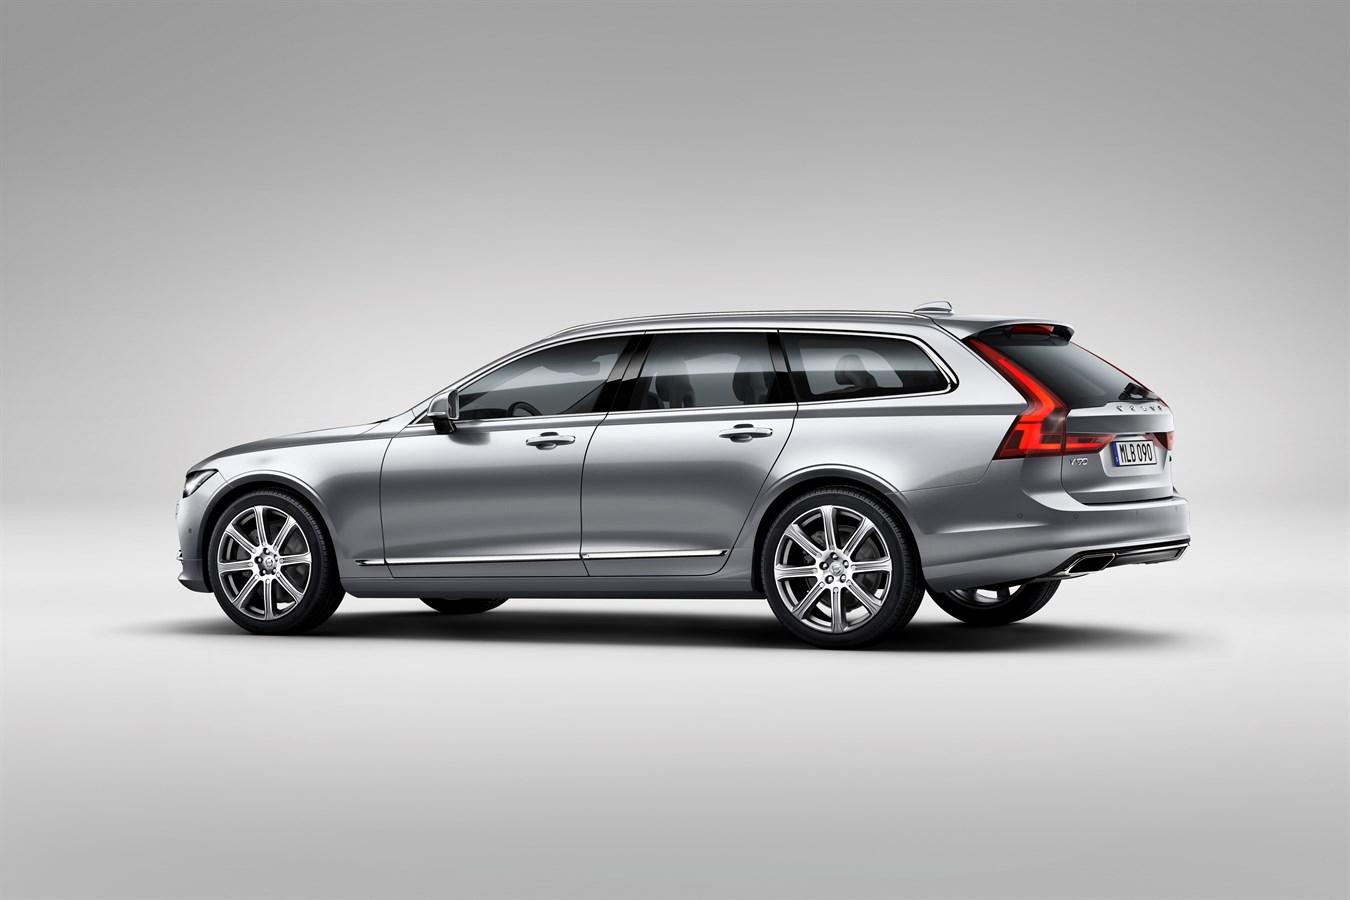 Volvo Cars Reveals Stylish And Versatile New V90 Wagon Car Usa Newsroom